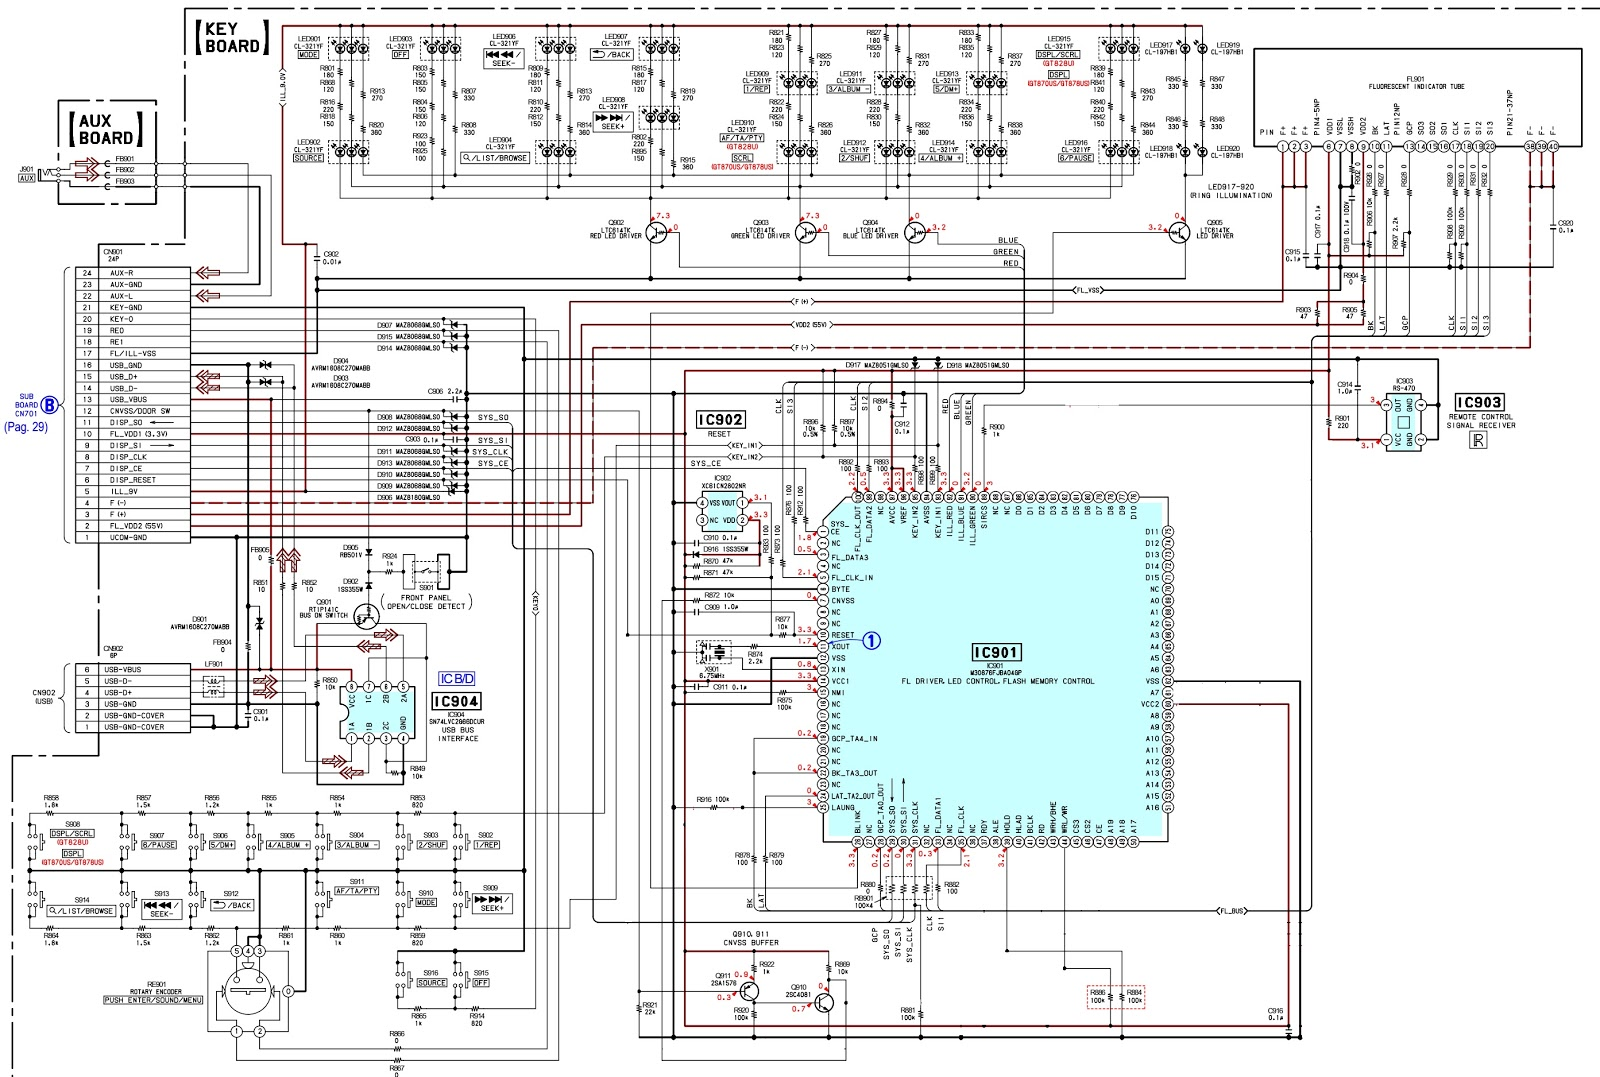 cdx gt827ux sony car radio circuit diagram wiring diagram. Black Bedroom Furniture Sets. Home Design Ideas